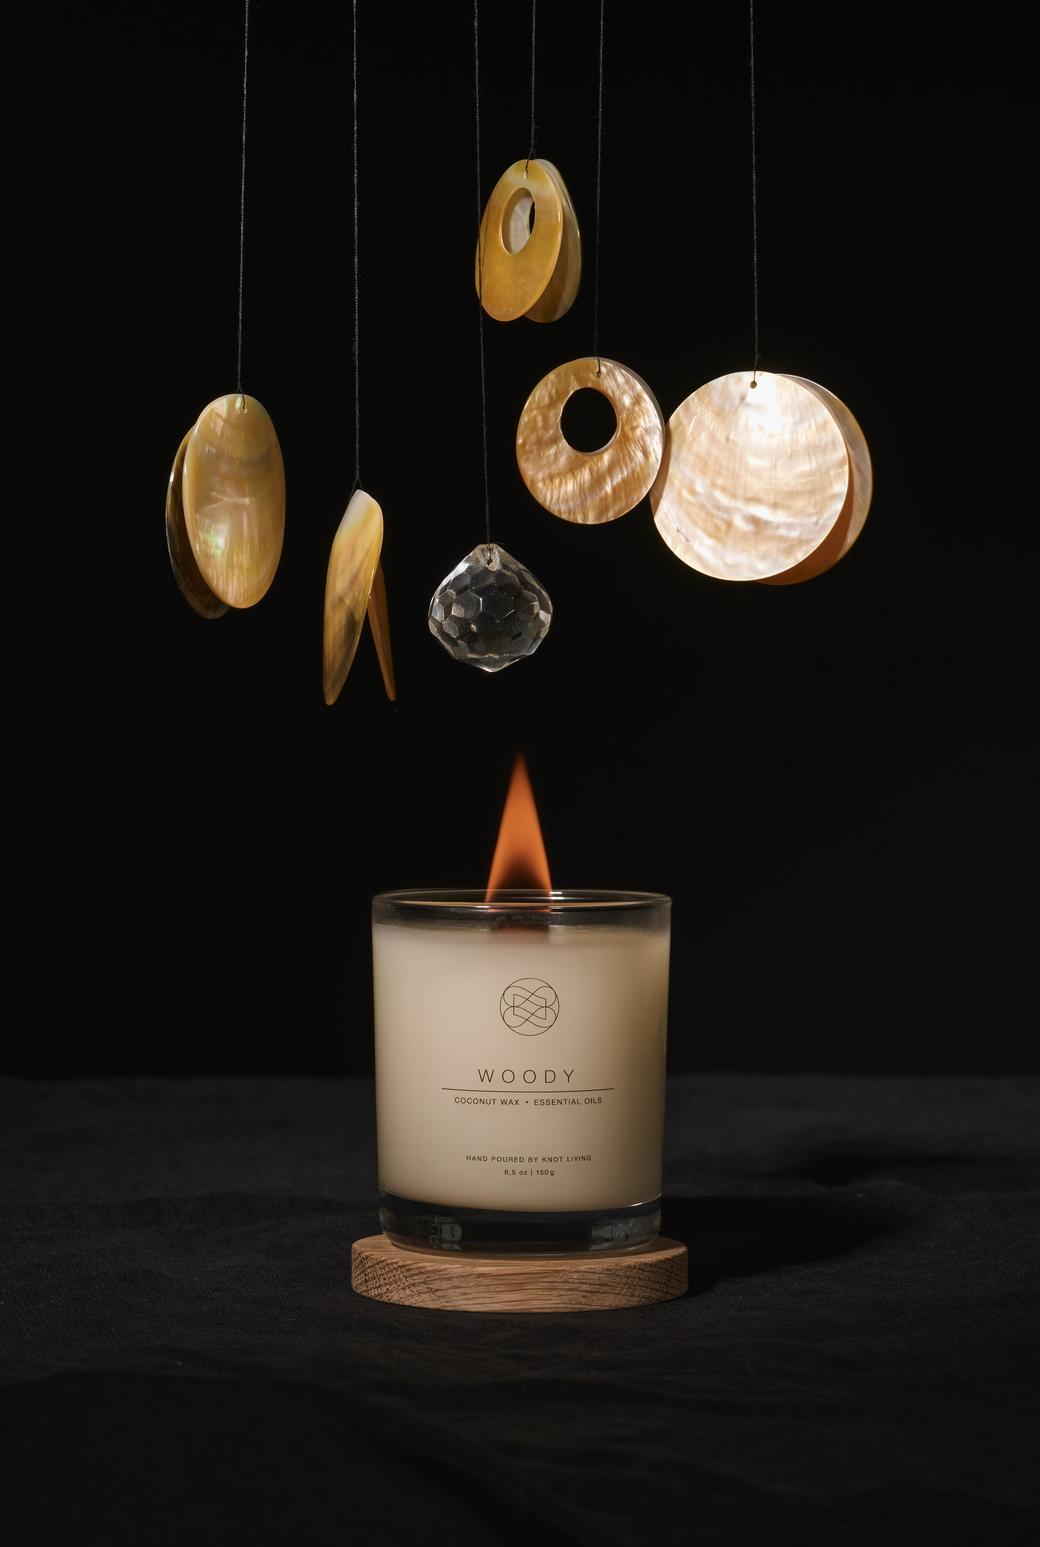 Свеча из кокосового воска с древесным фитилем Woody